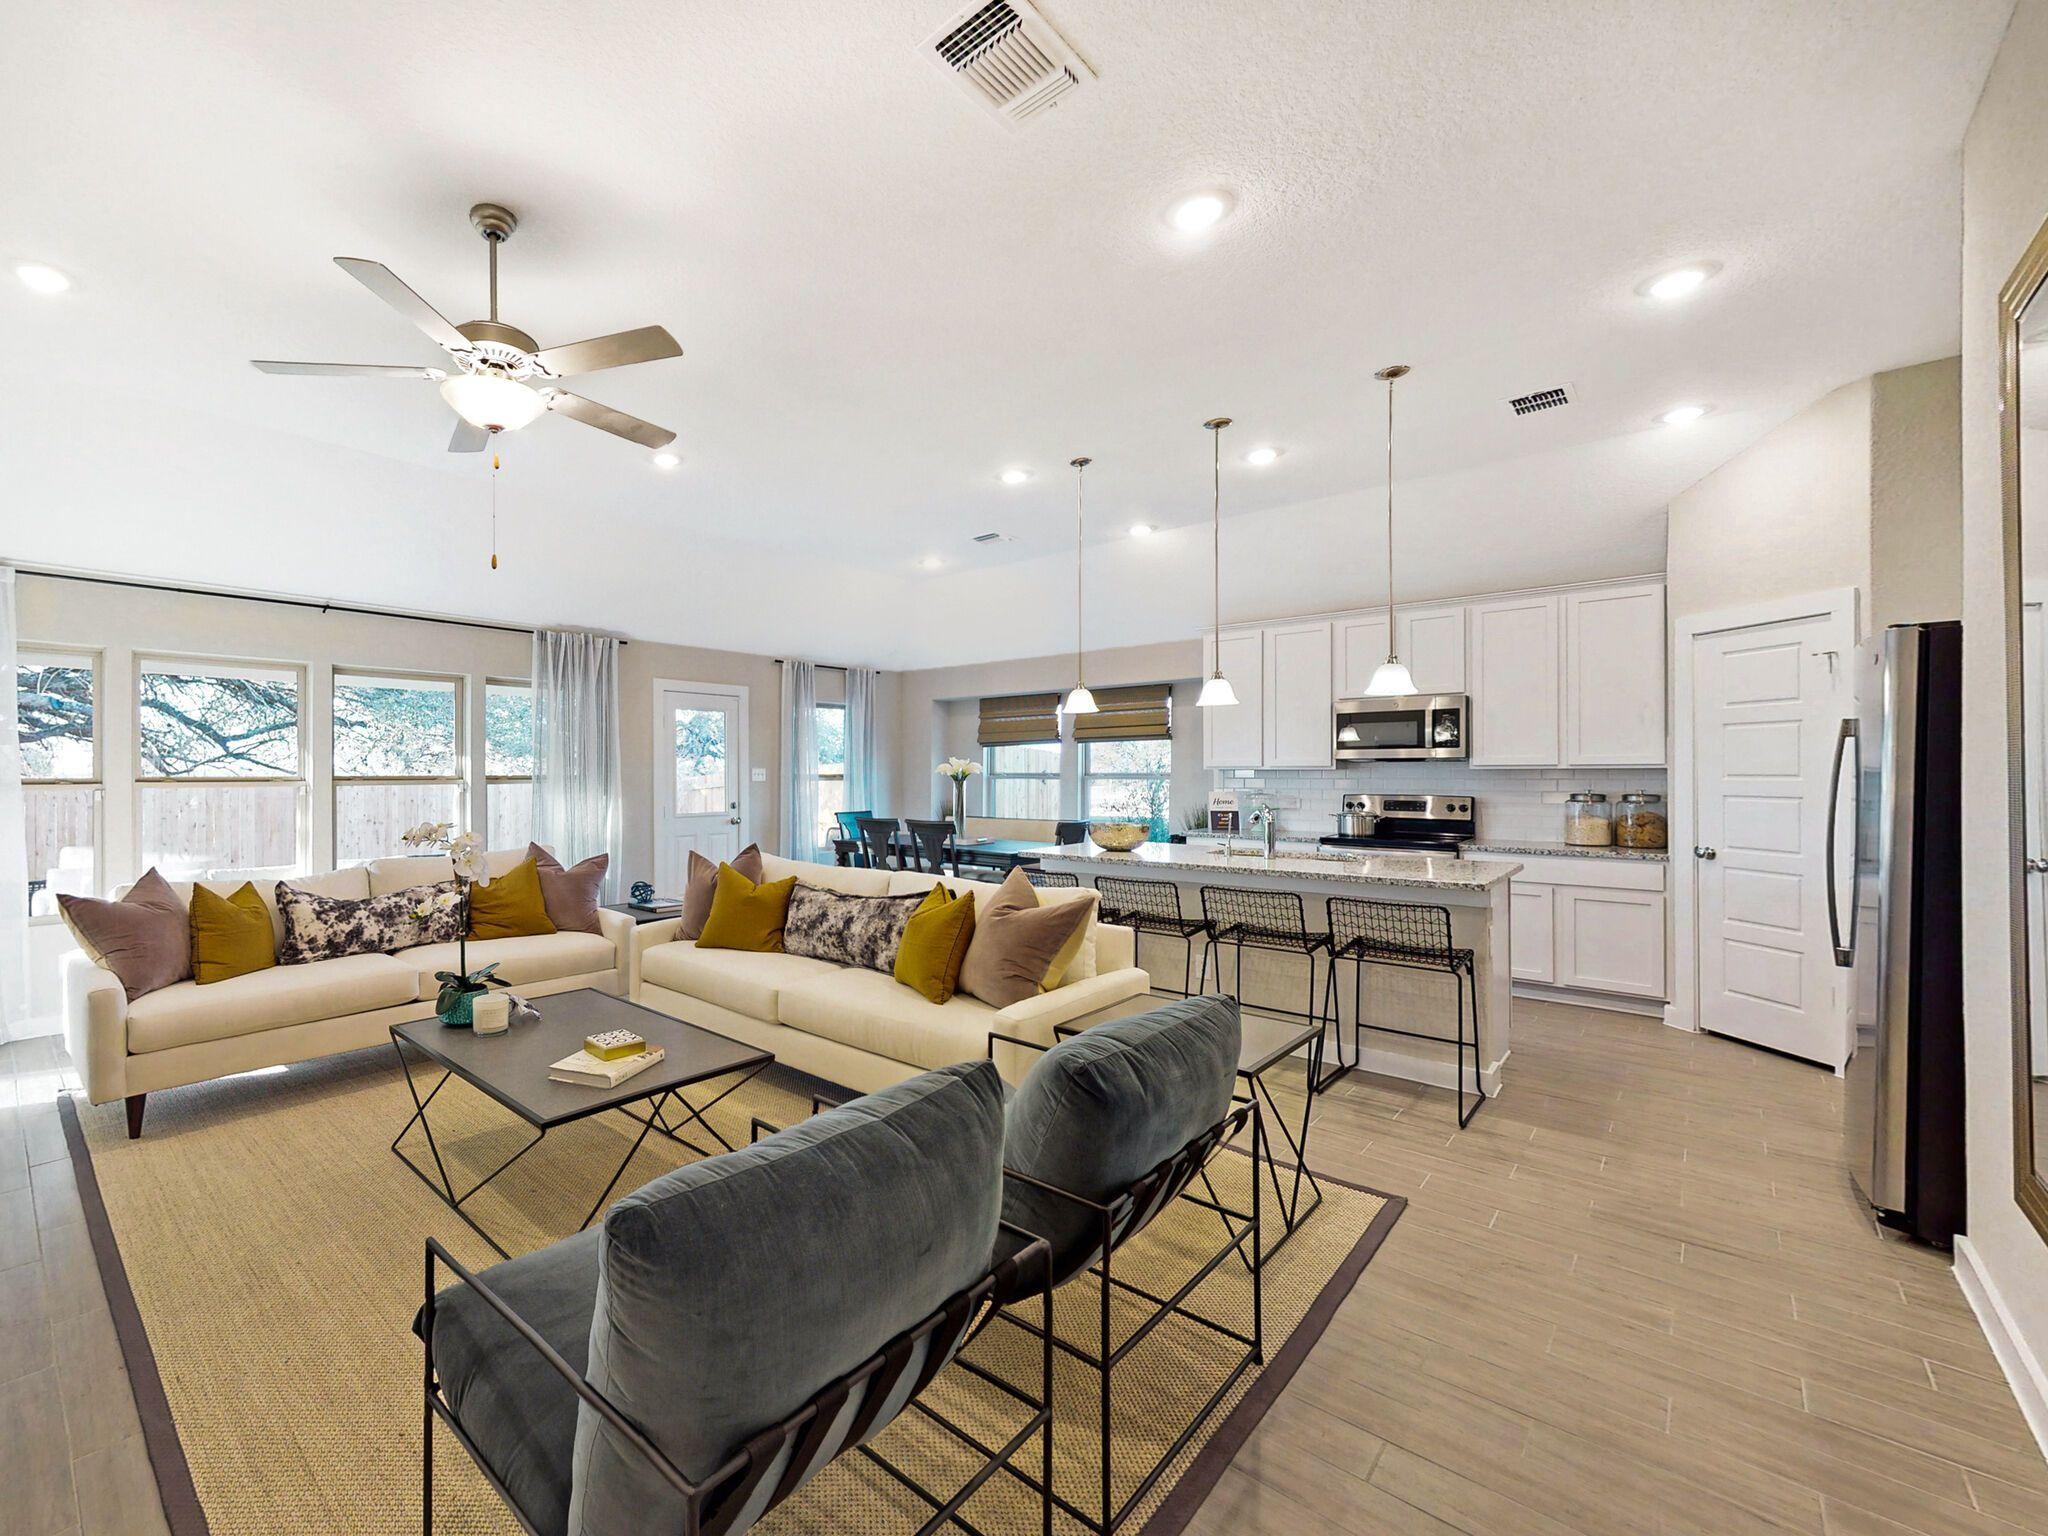 'Greenspoint Heights' by M/I Homes-San Antonio in San Antonio